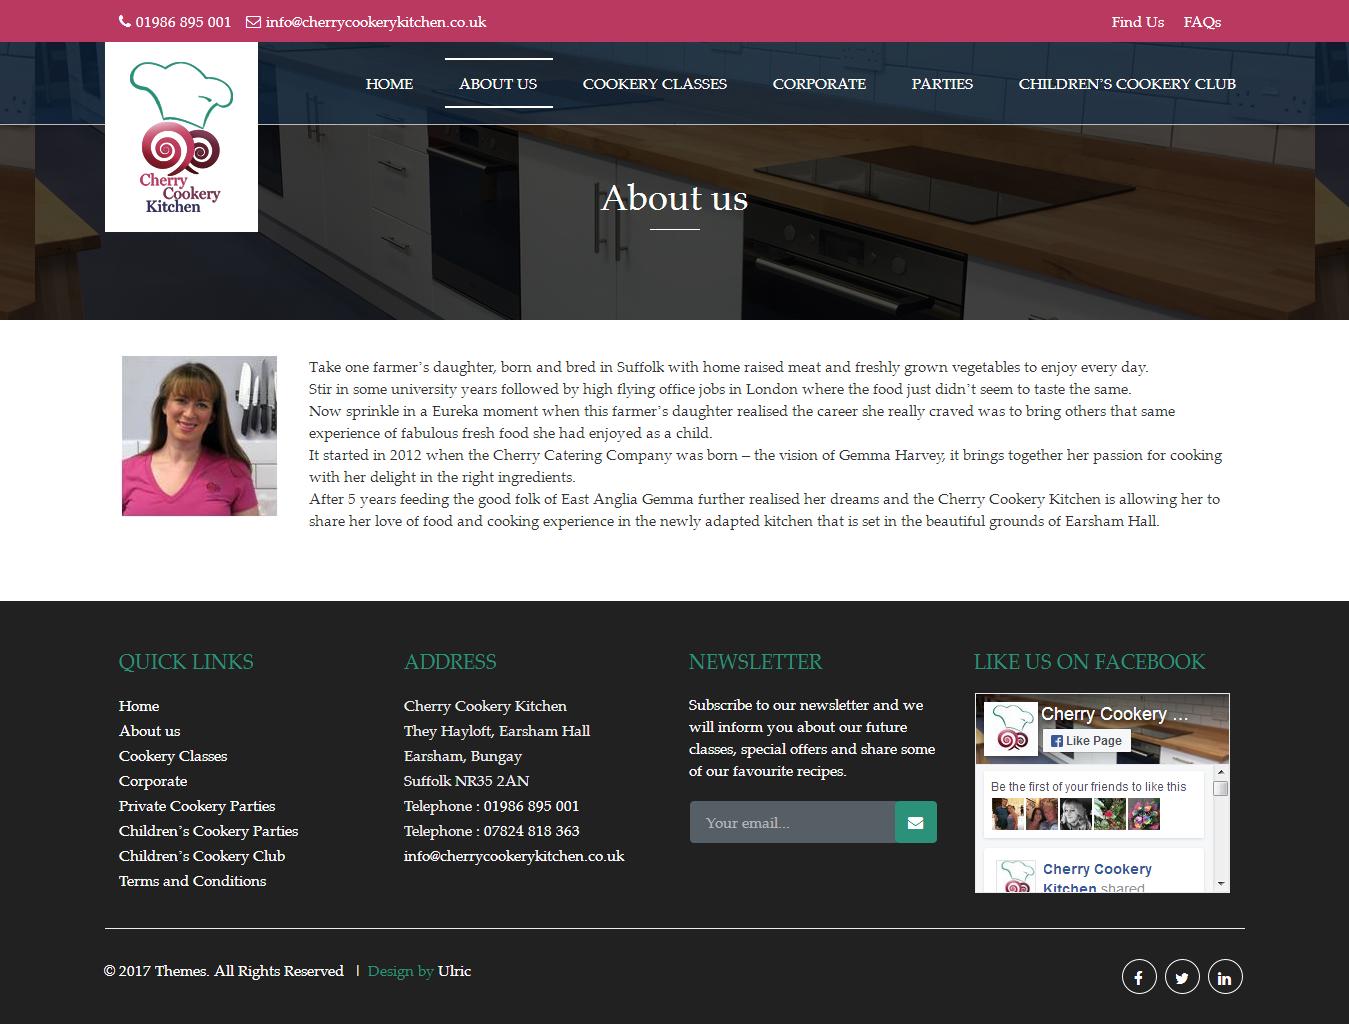 Cherry Cookery Kitchen - Web Design Diss - Website Designers in Diss ...